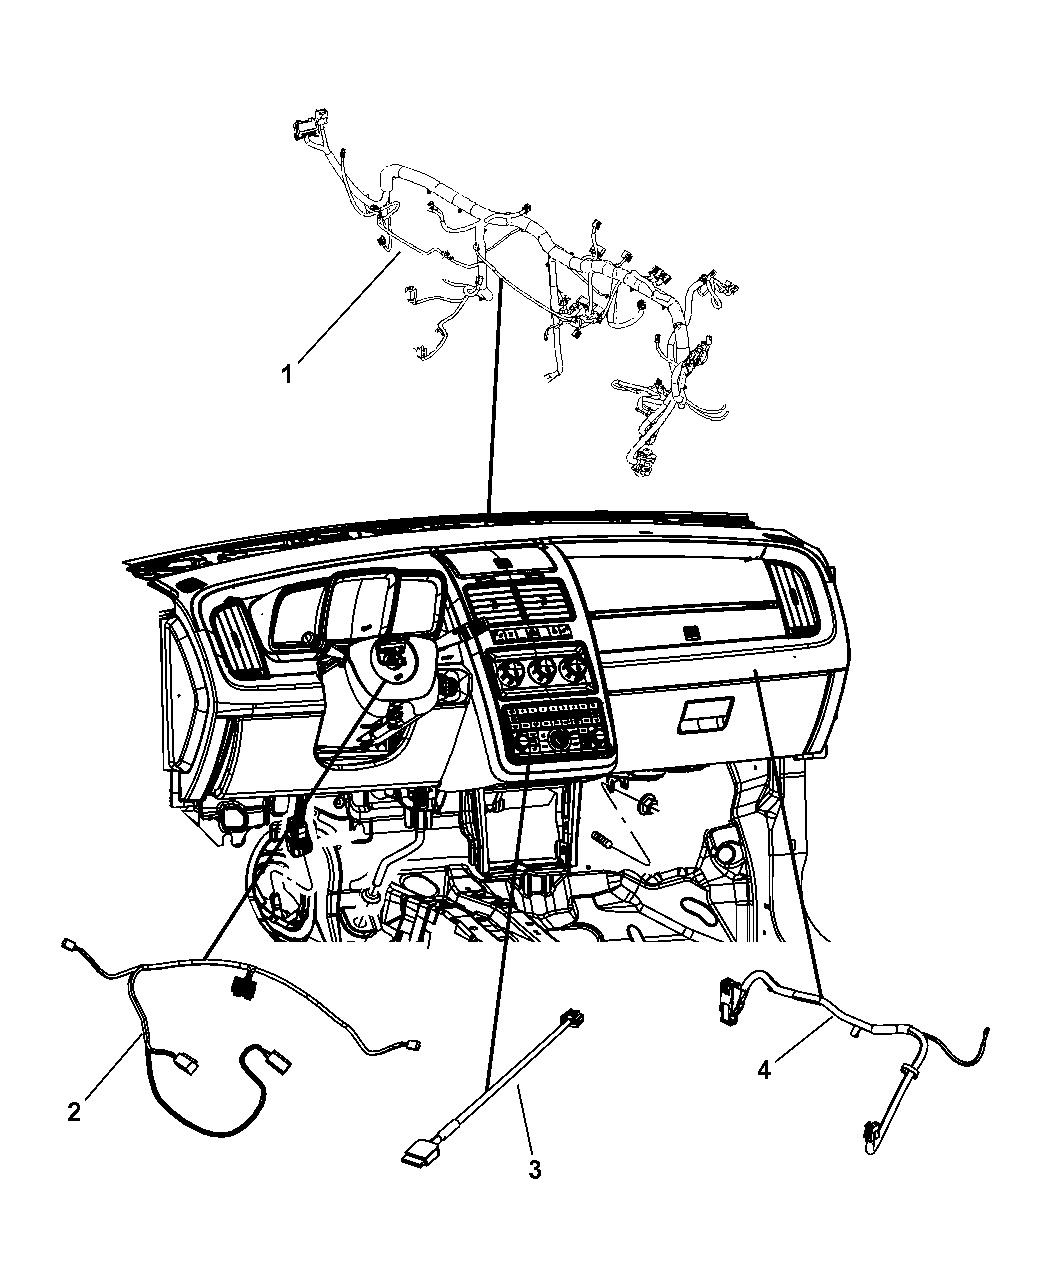 2010 Dodge Journey Wiring Instrument Panel - Mopar Parts Giant